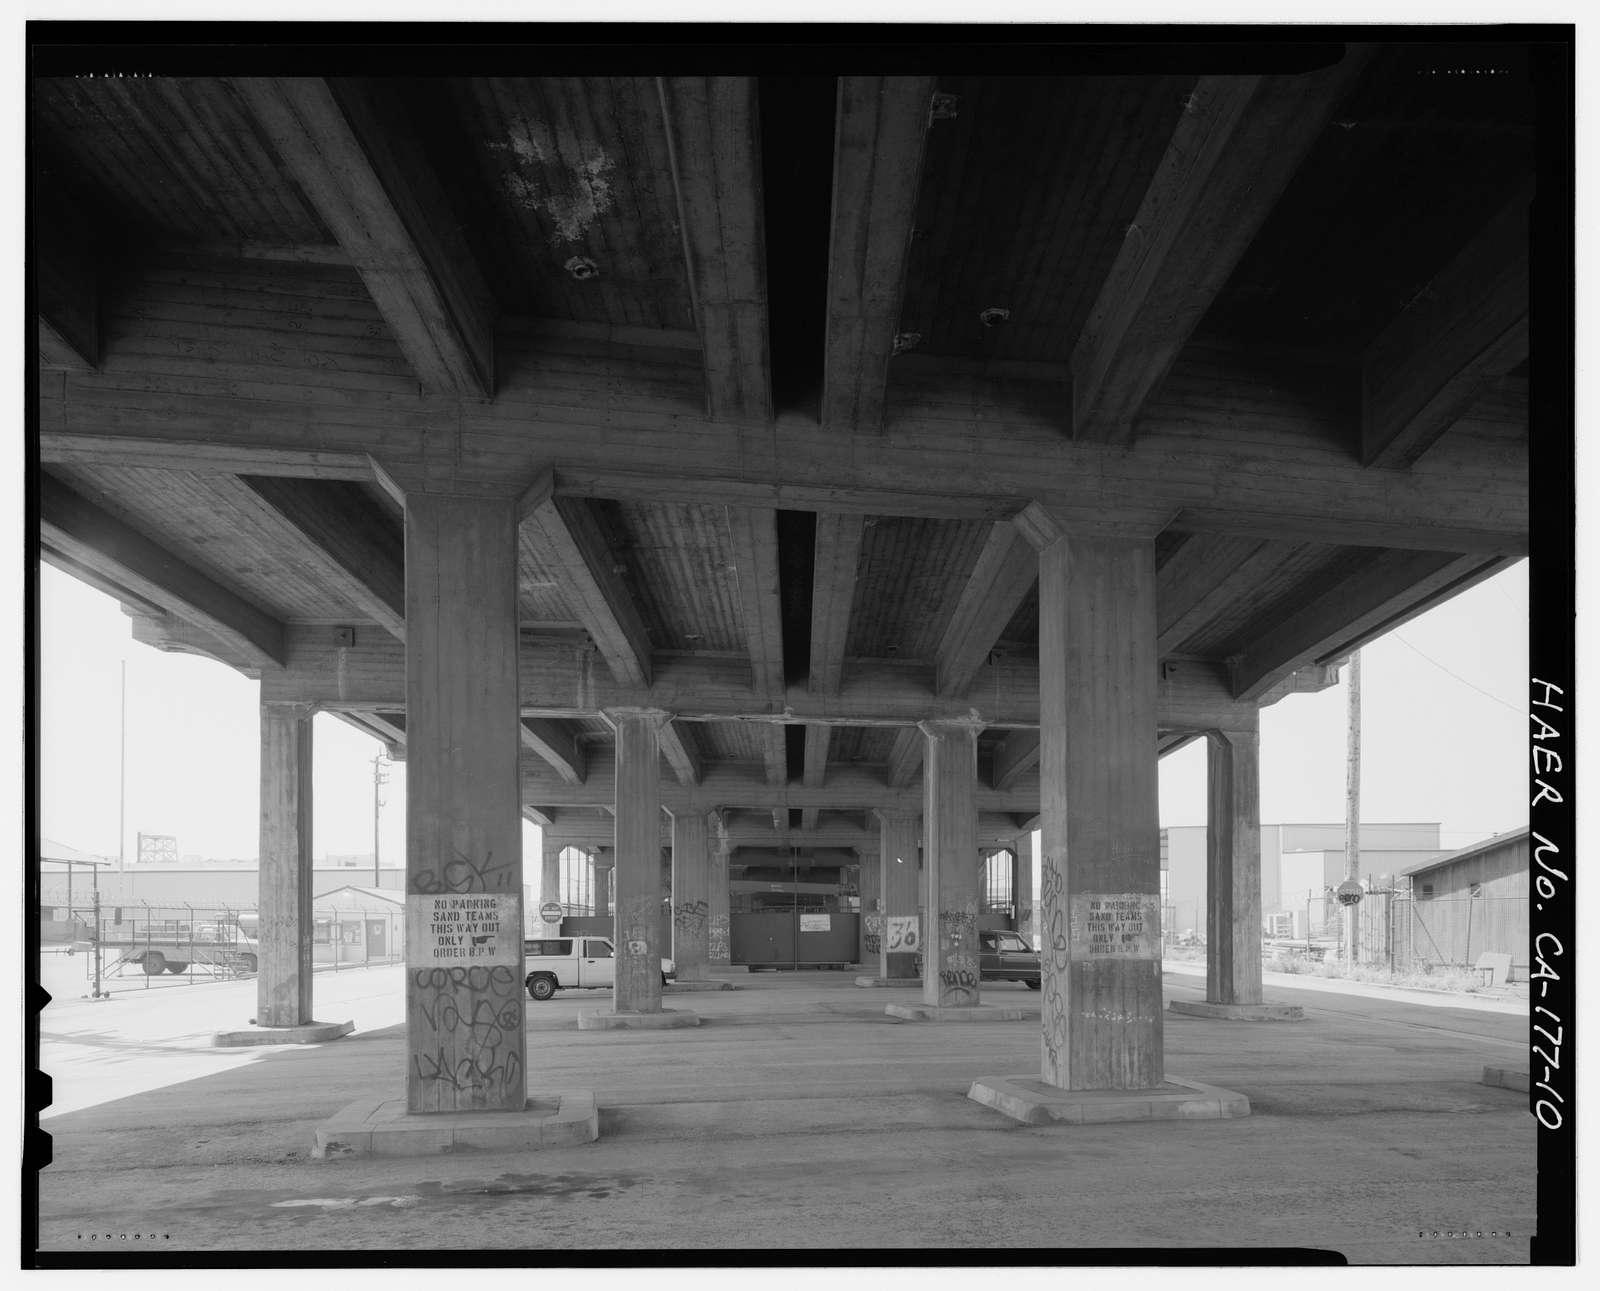 Ninth Street Viaduct, Spanning Los Angeles River at Olympic Boulevard, Los Angeles, Los Angeles County, CA